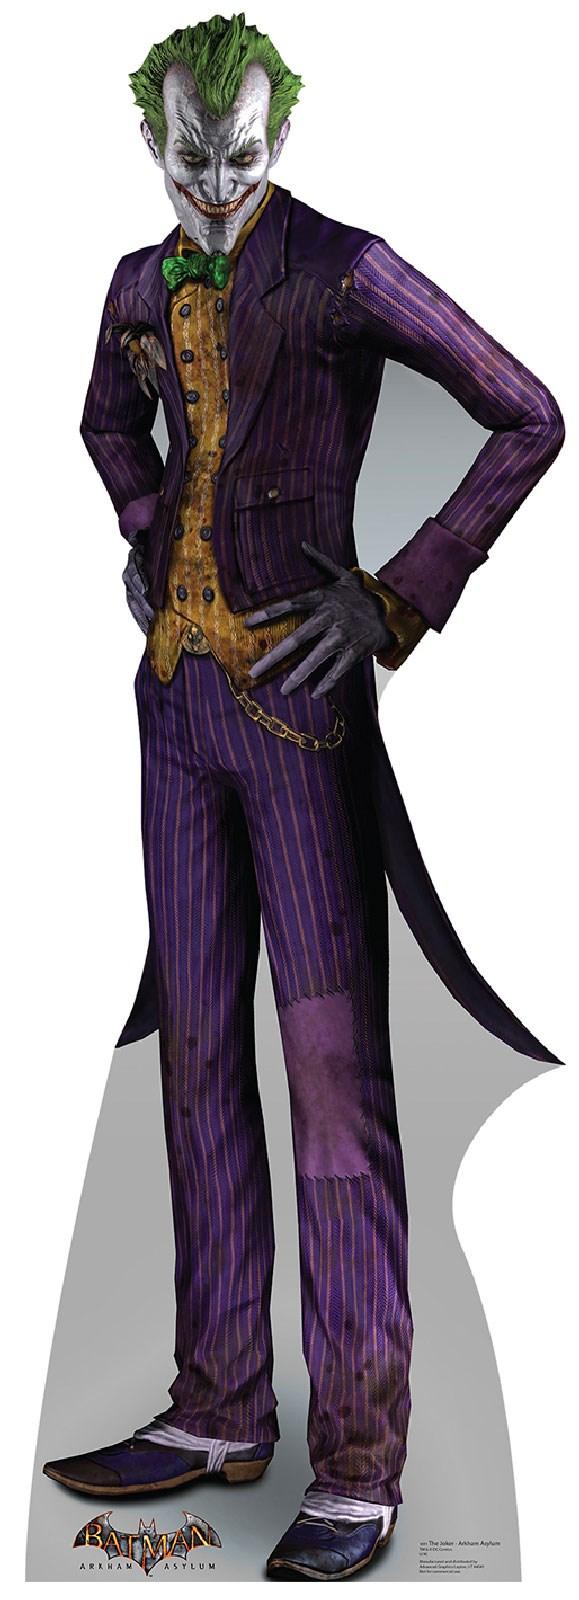 Arkham Asylum - The Joker Cardboard Stand Up 6